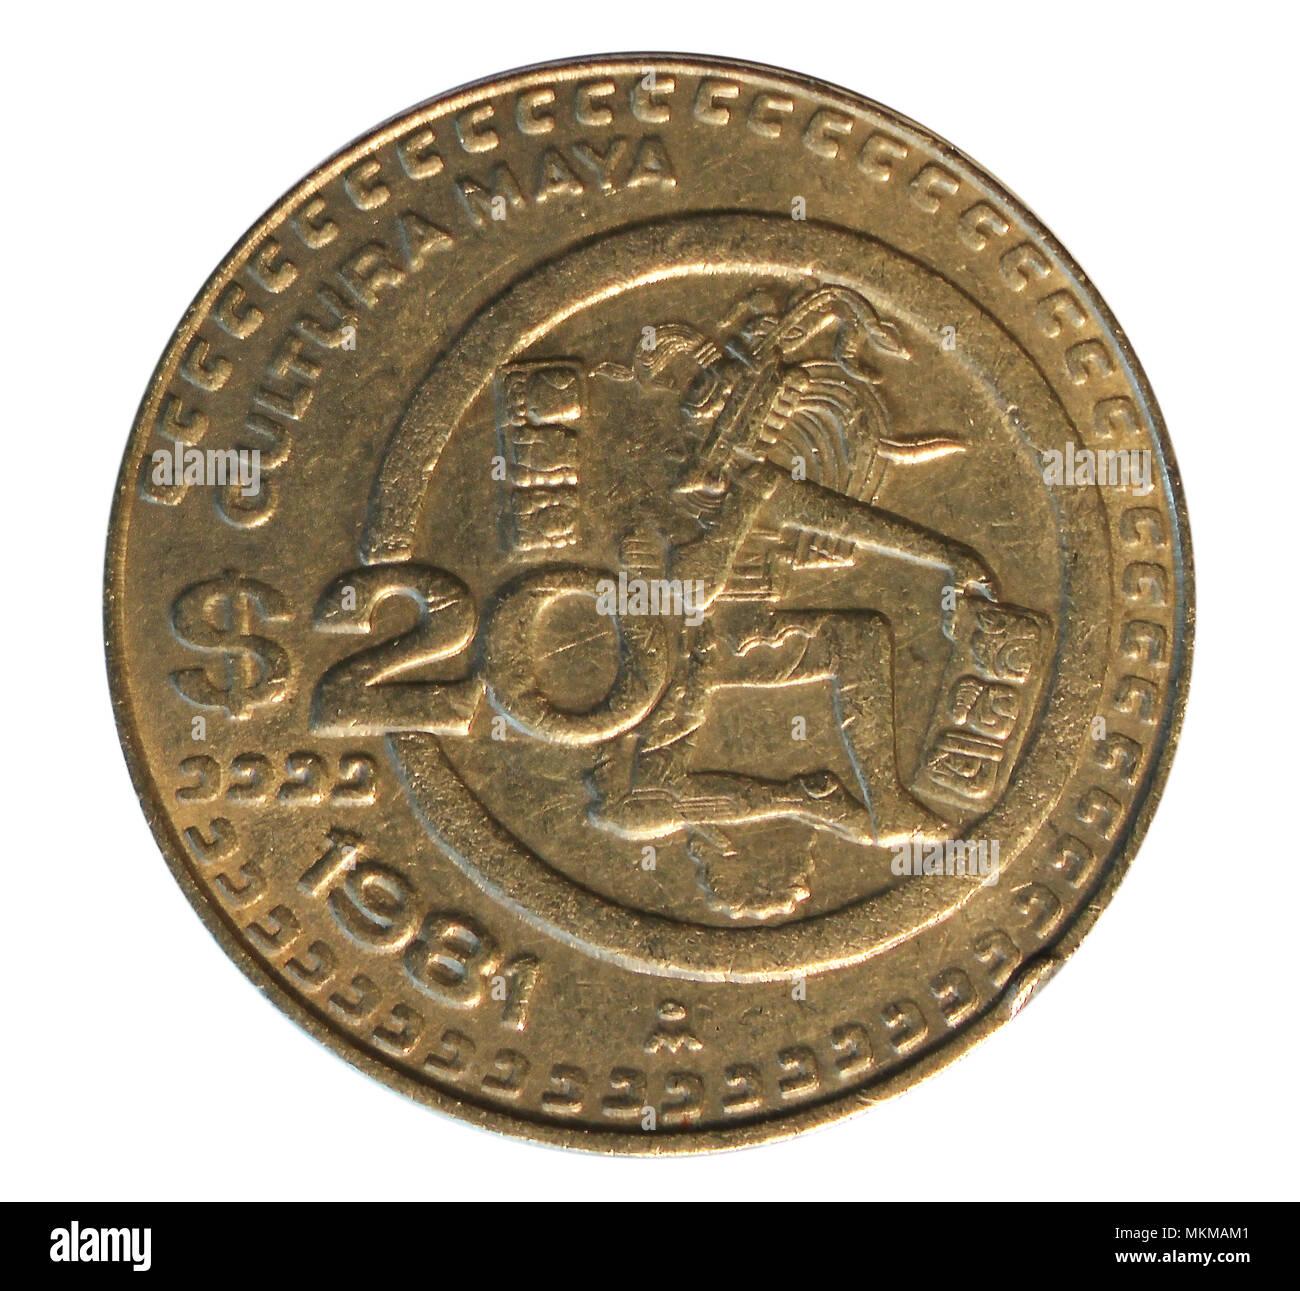 Twenty peso coin. Bank of Mexico. Obverse. 1981 - Stock Image